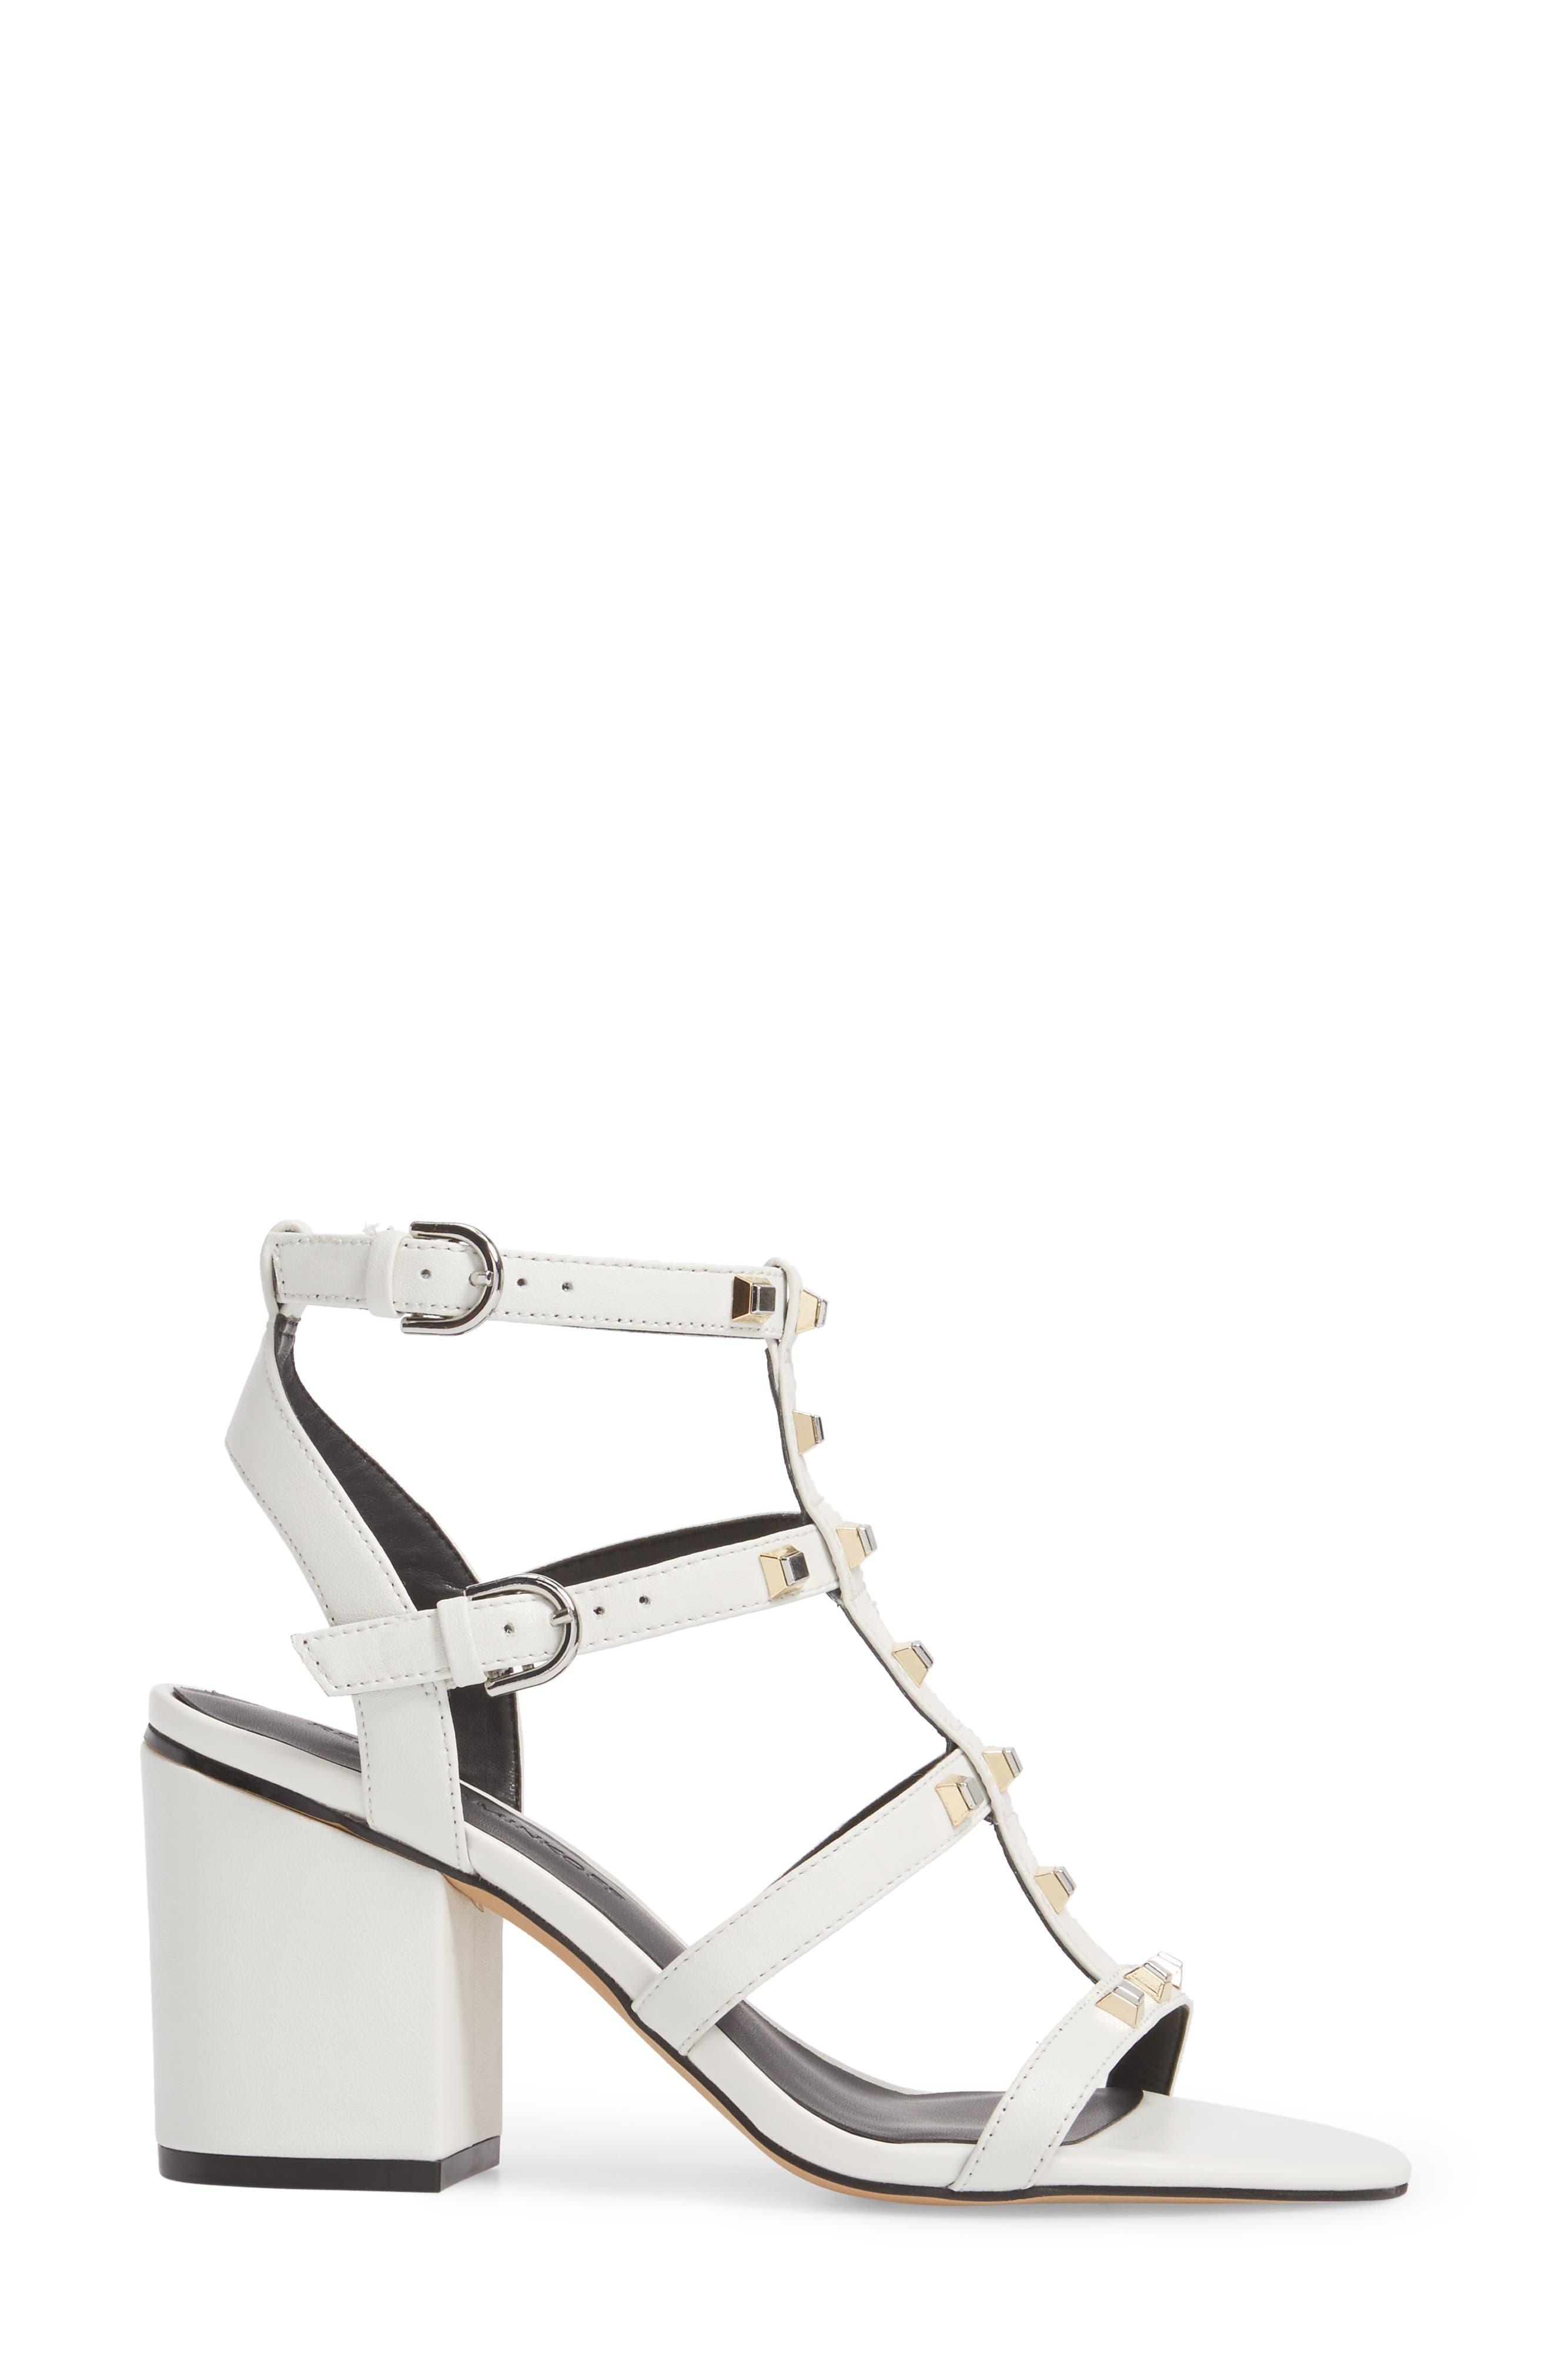 Lenore Sandal,                             Alternate thumbnail 3, color,                             Optic White Leather